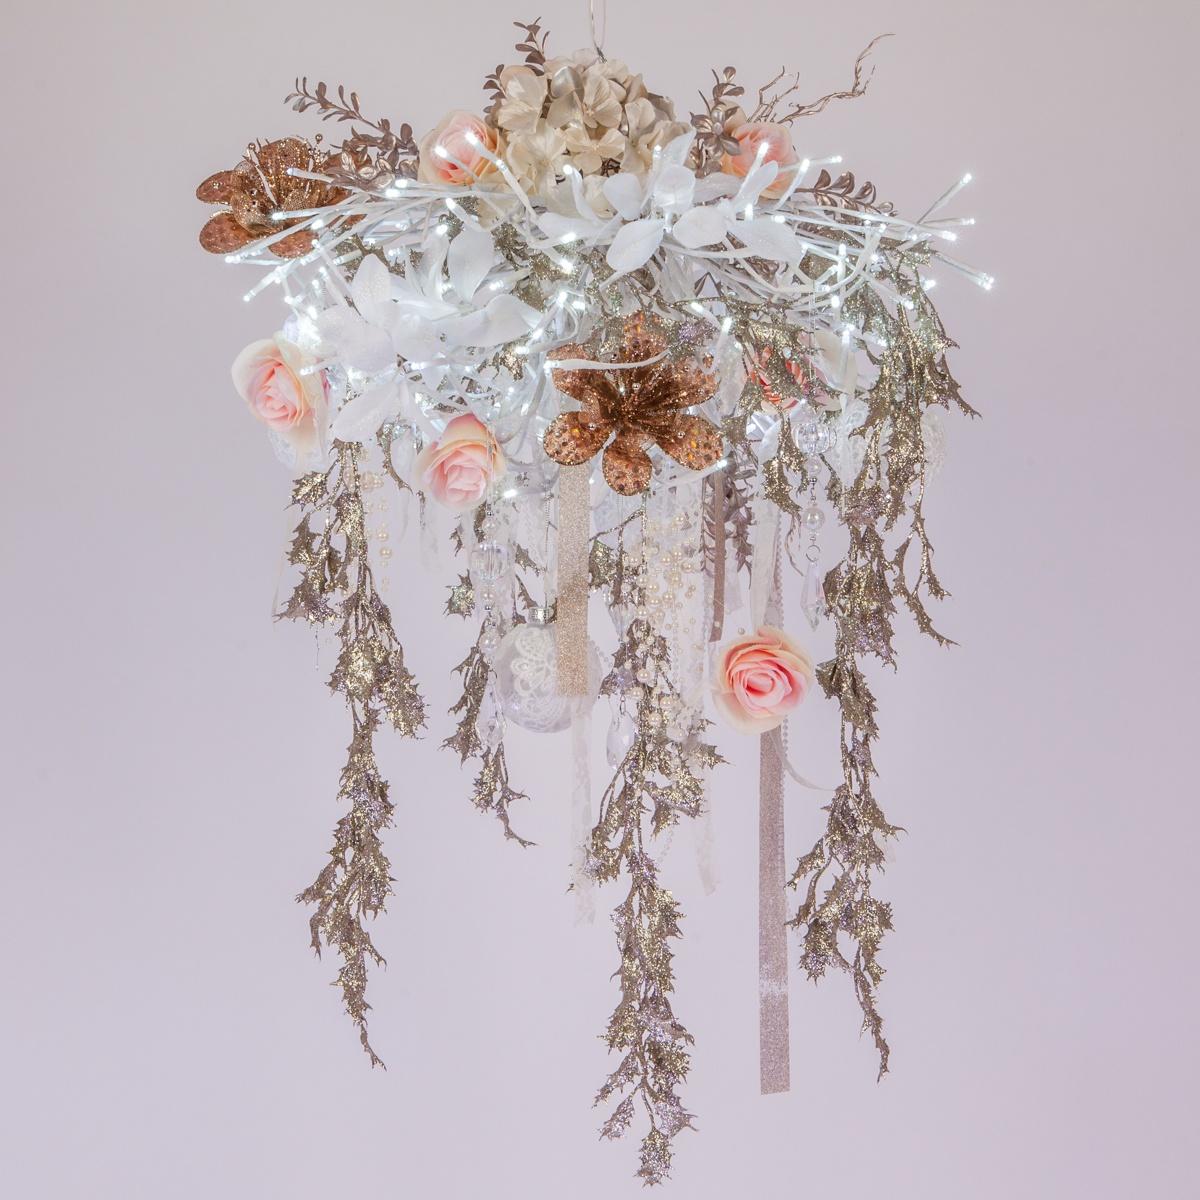 Rose Gold & White Wedding Decor -  DIY Flower Chandelier